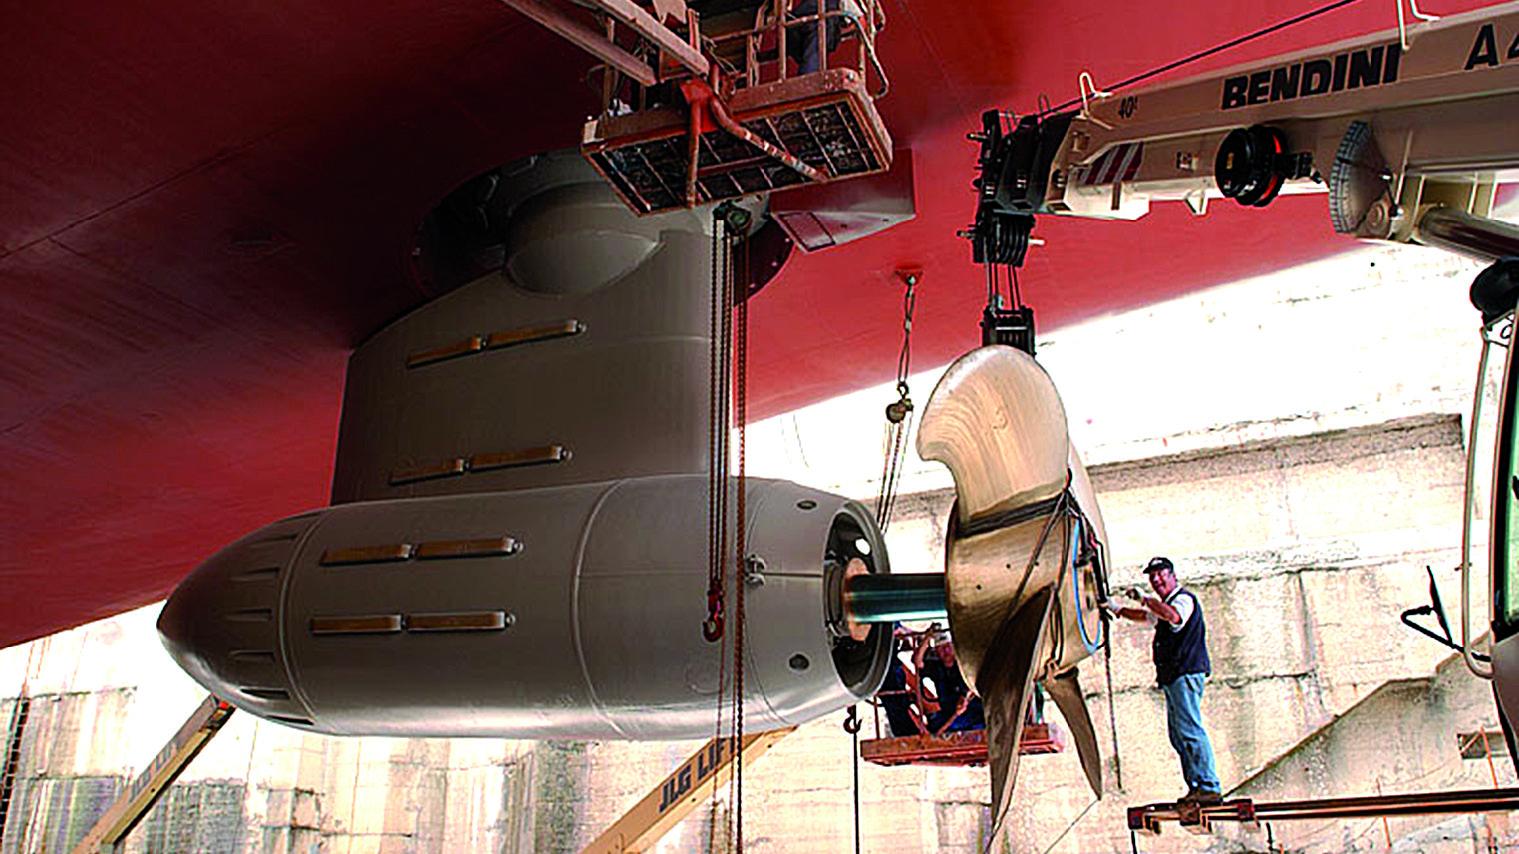 Electric podded propulsor